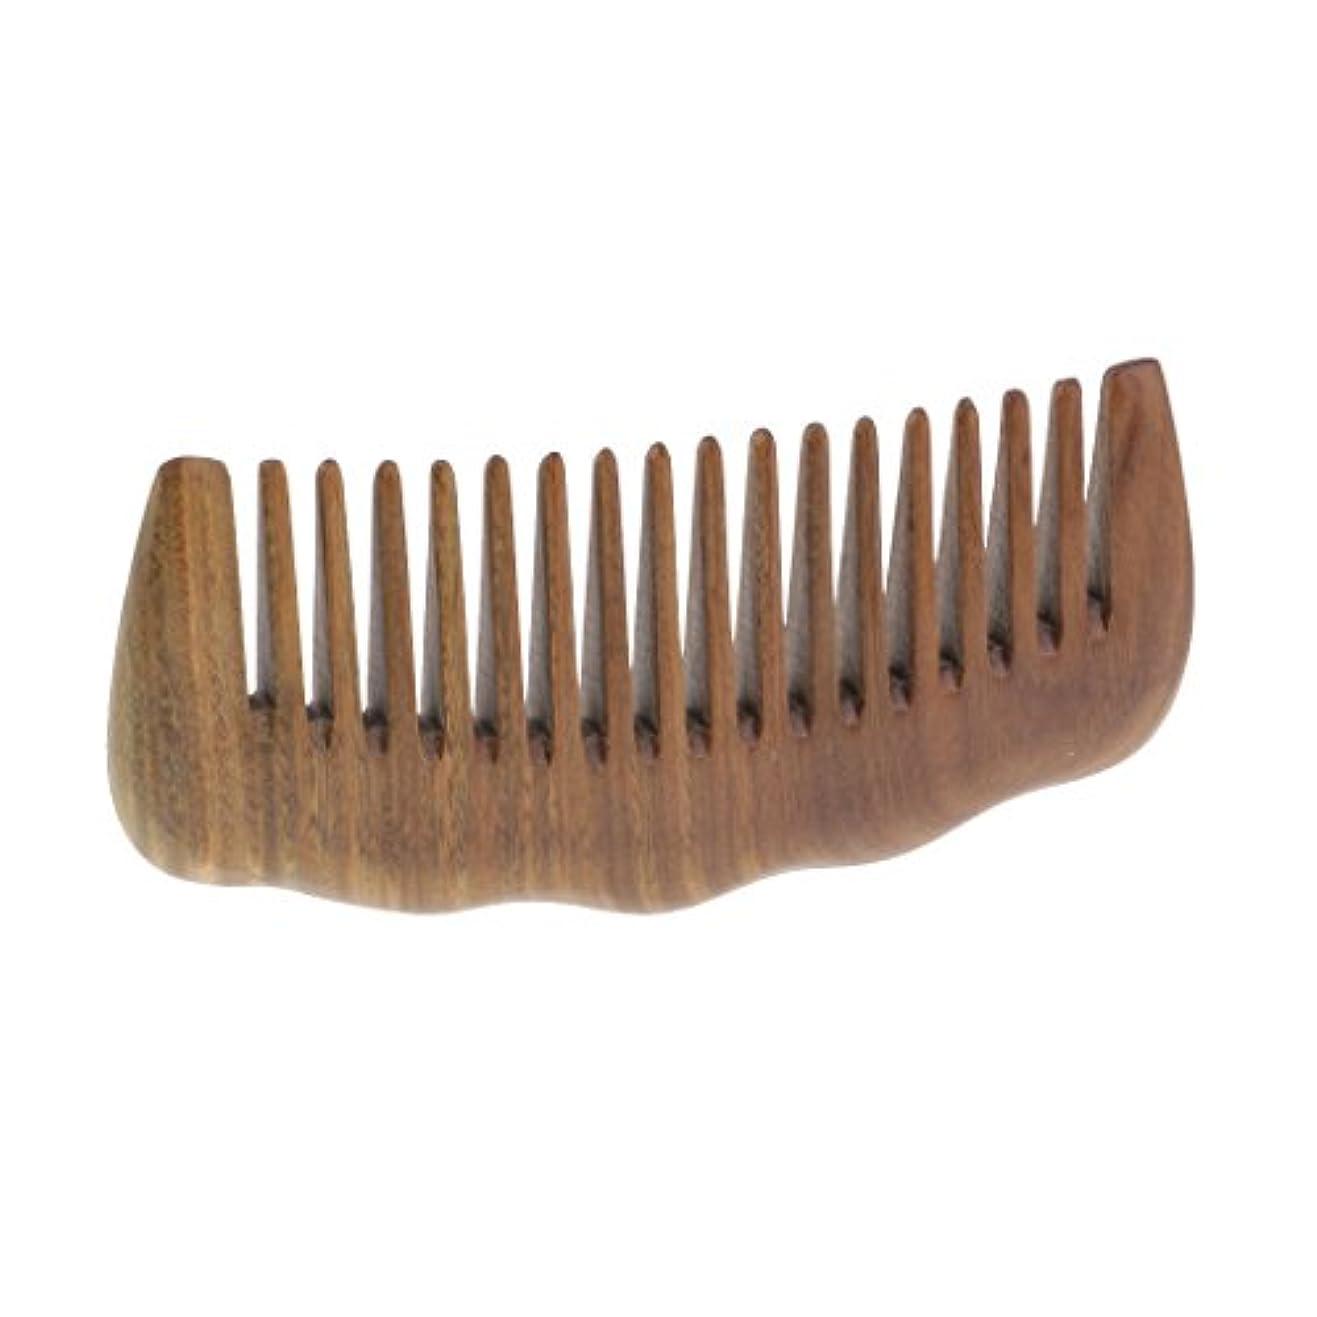 Kesoto ウッドコーム 木製櫛 頭皮マッサージ 伝統工芸品 滑らか ヘアケア ナチュラルサンダルウッド 高品質